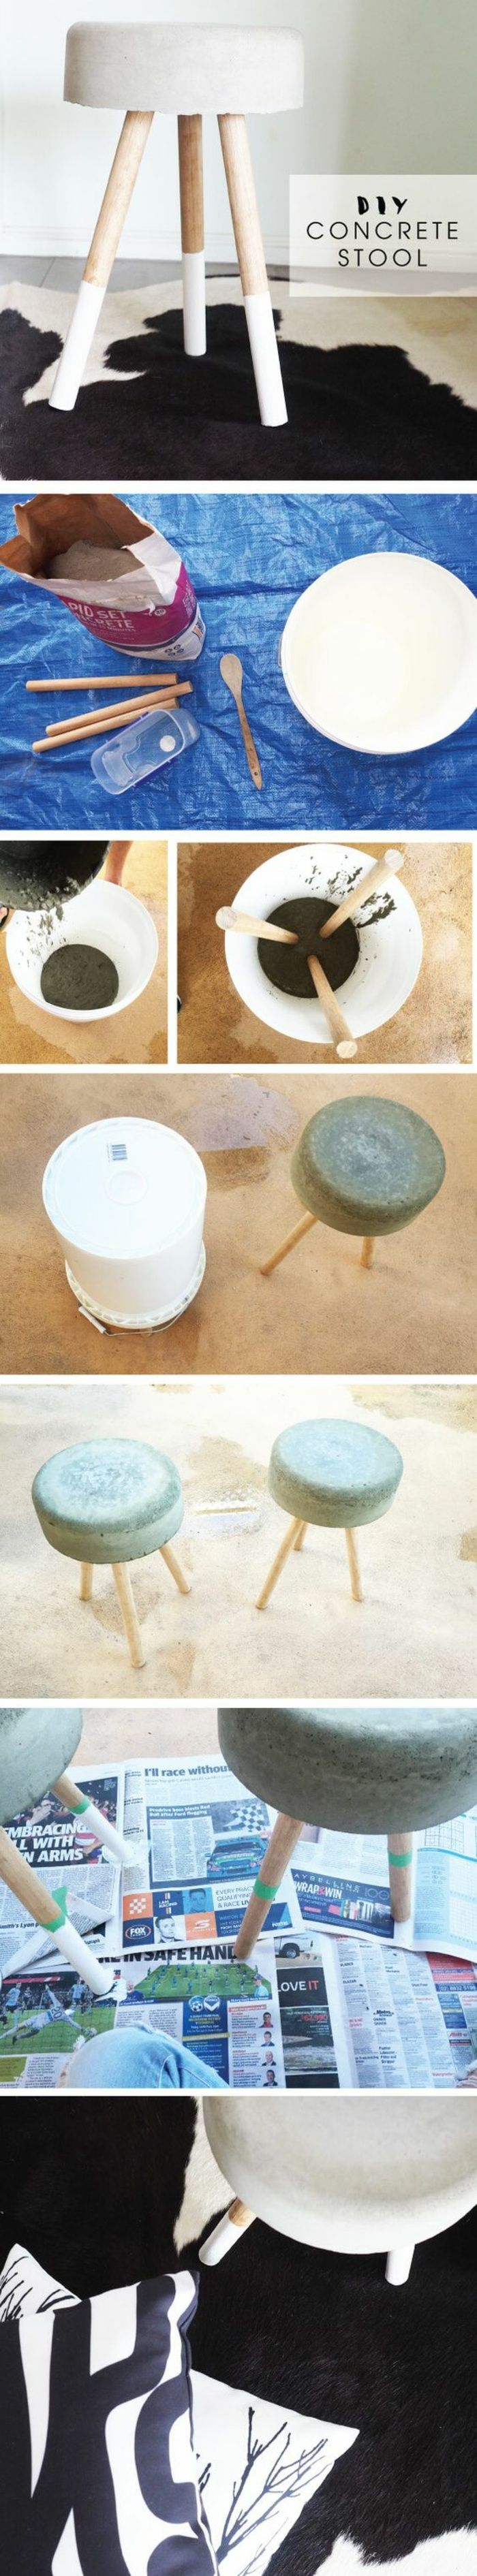 17 best ideas about basteln mit beton on pinterest kugellicht zement and beton basteln. Black Bedroom Furniture Sets. Home Design Ideas